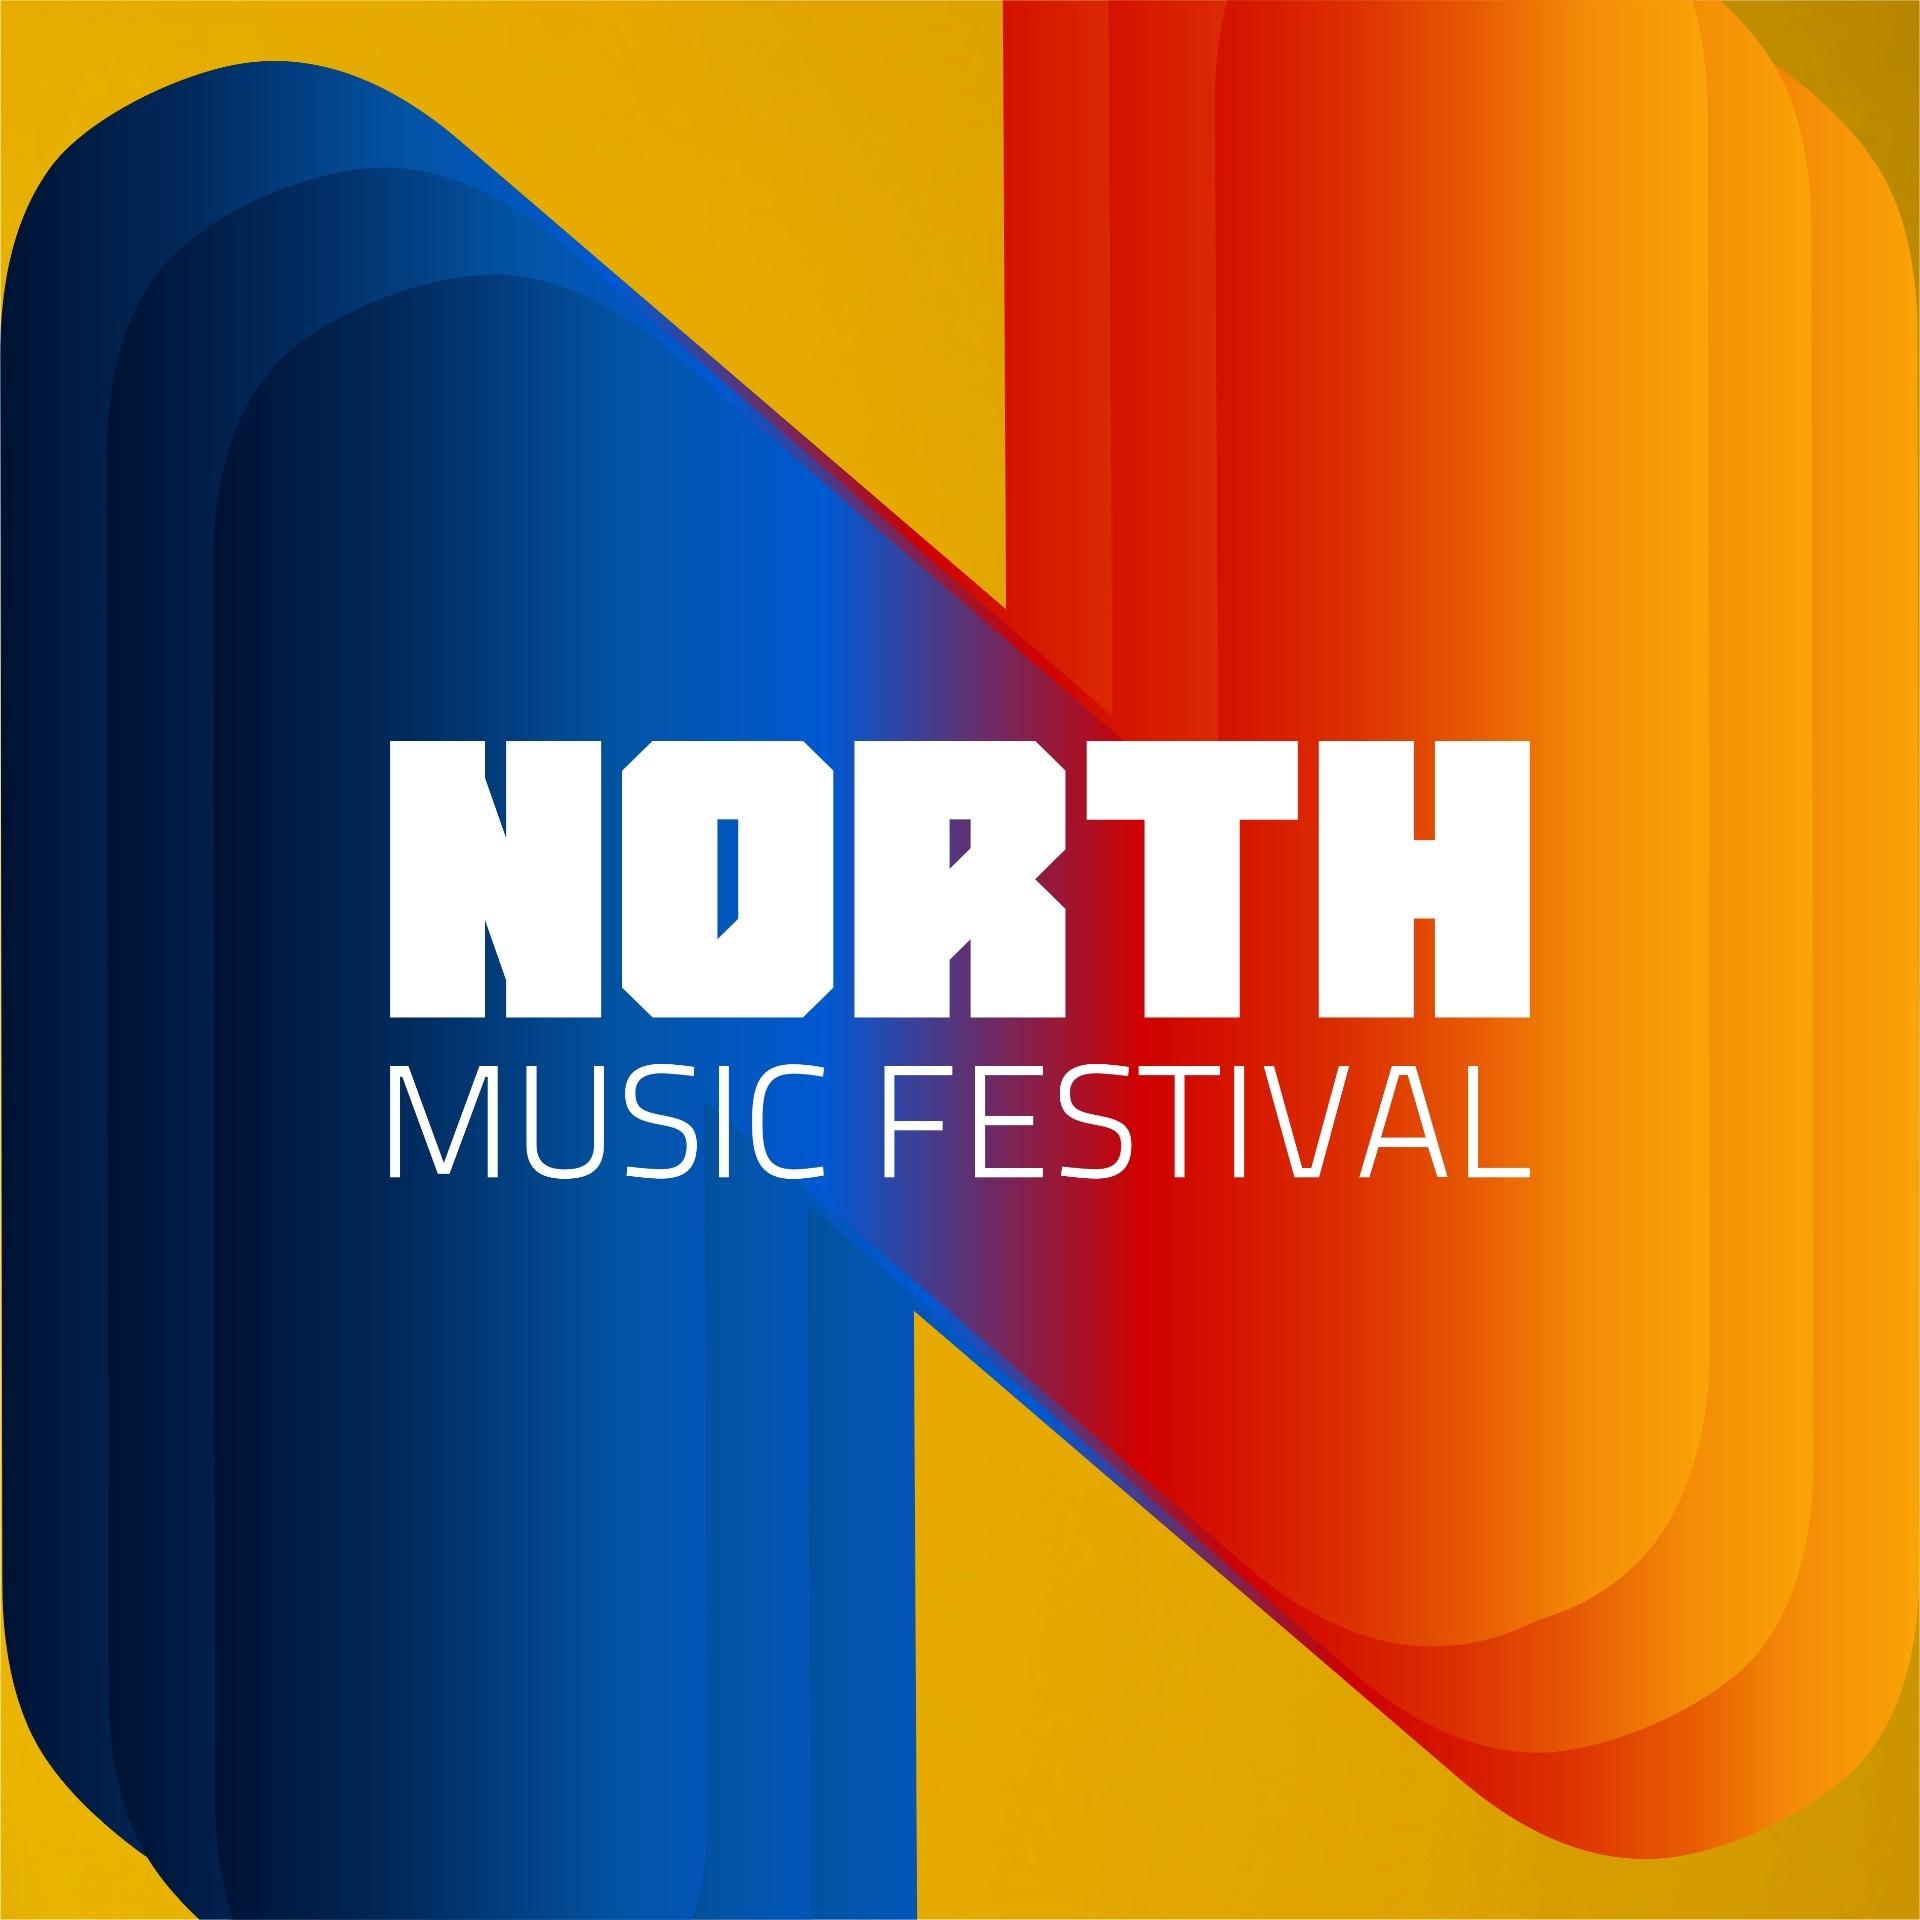 North Music Festival 2021 - cartaz